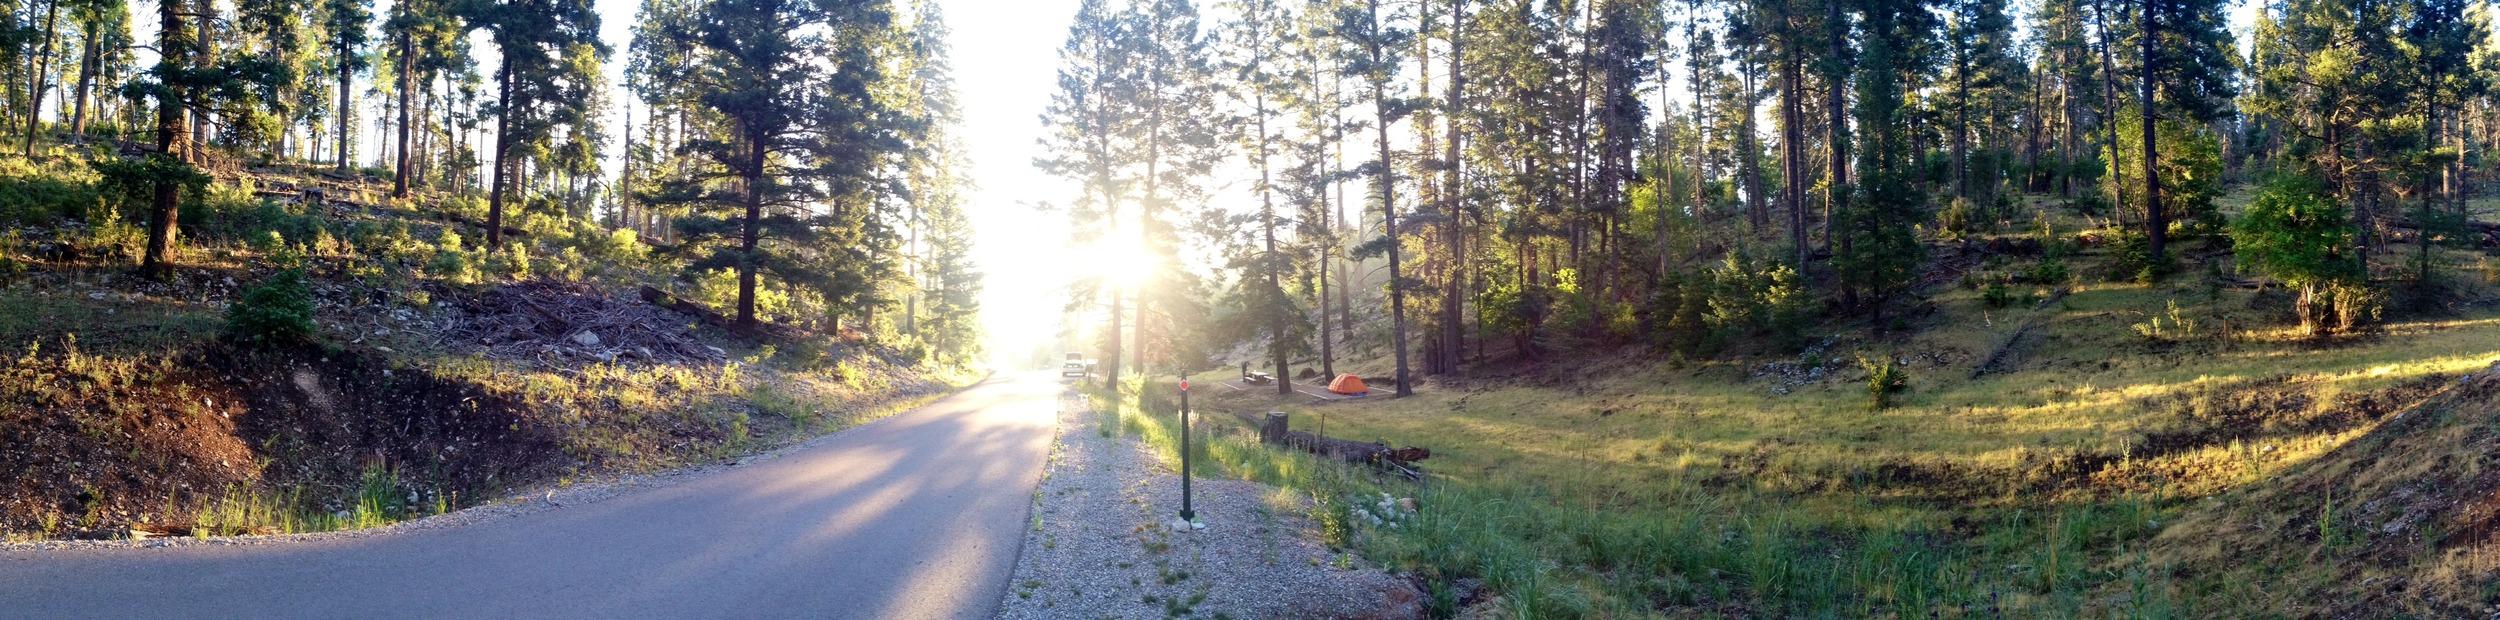 Road toward the campground at dawn